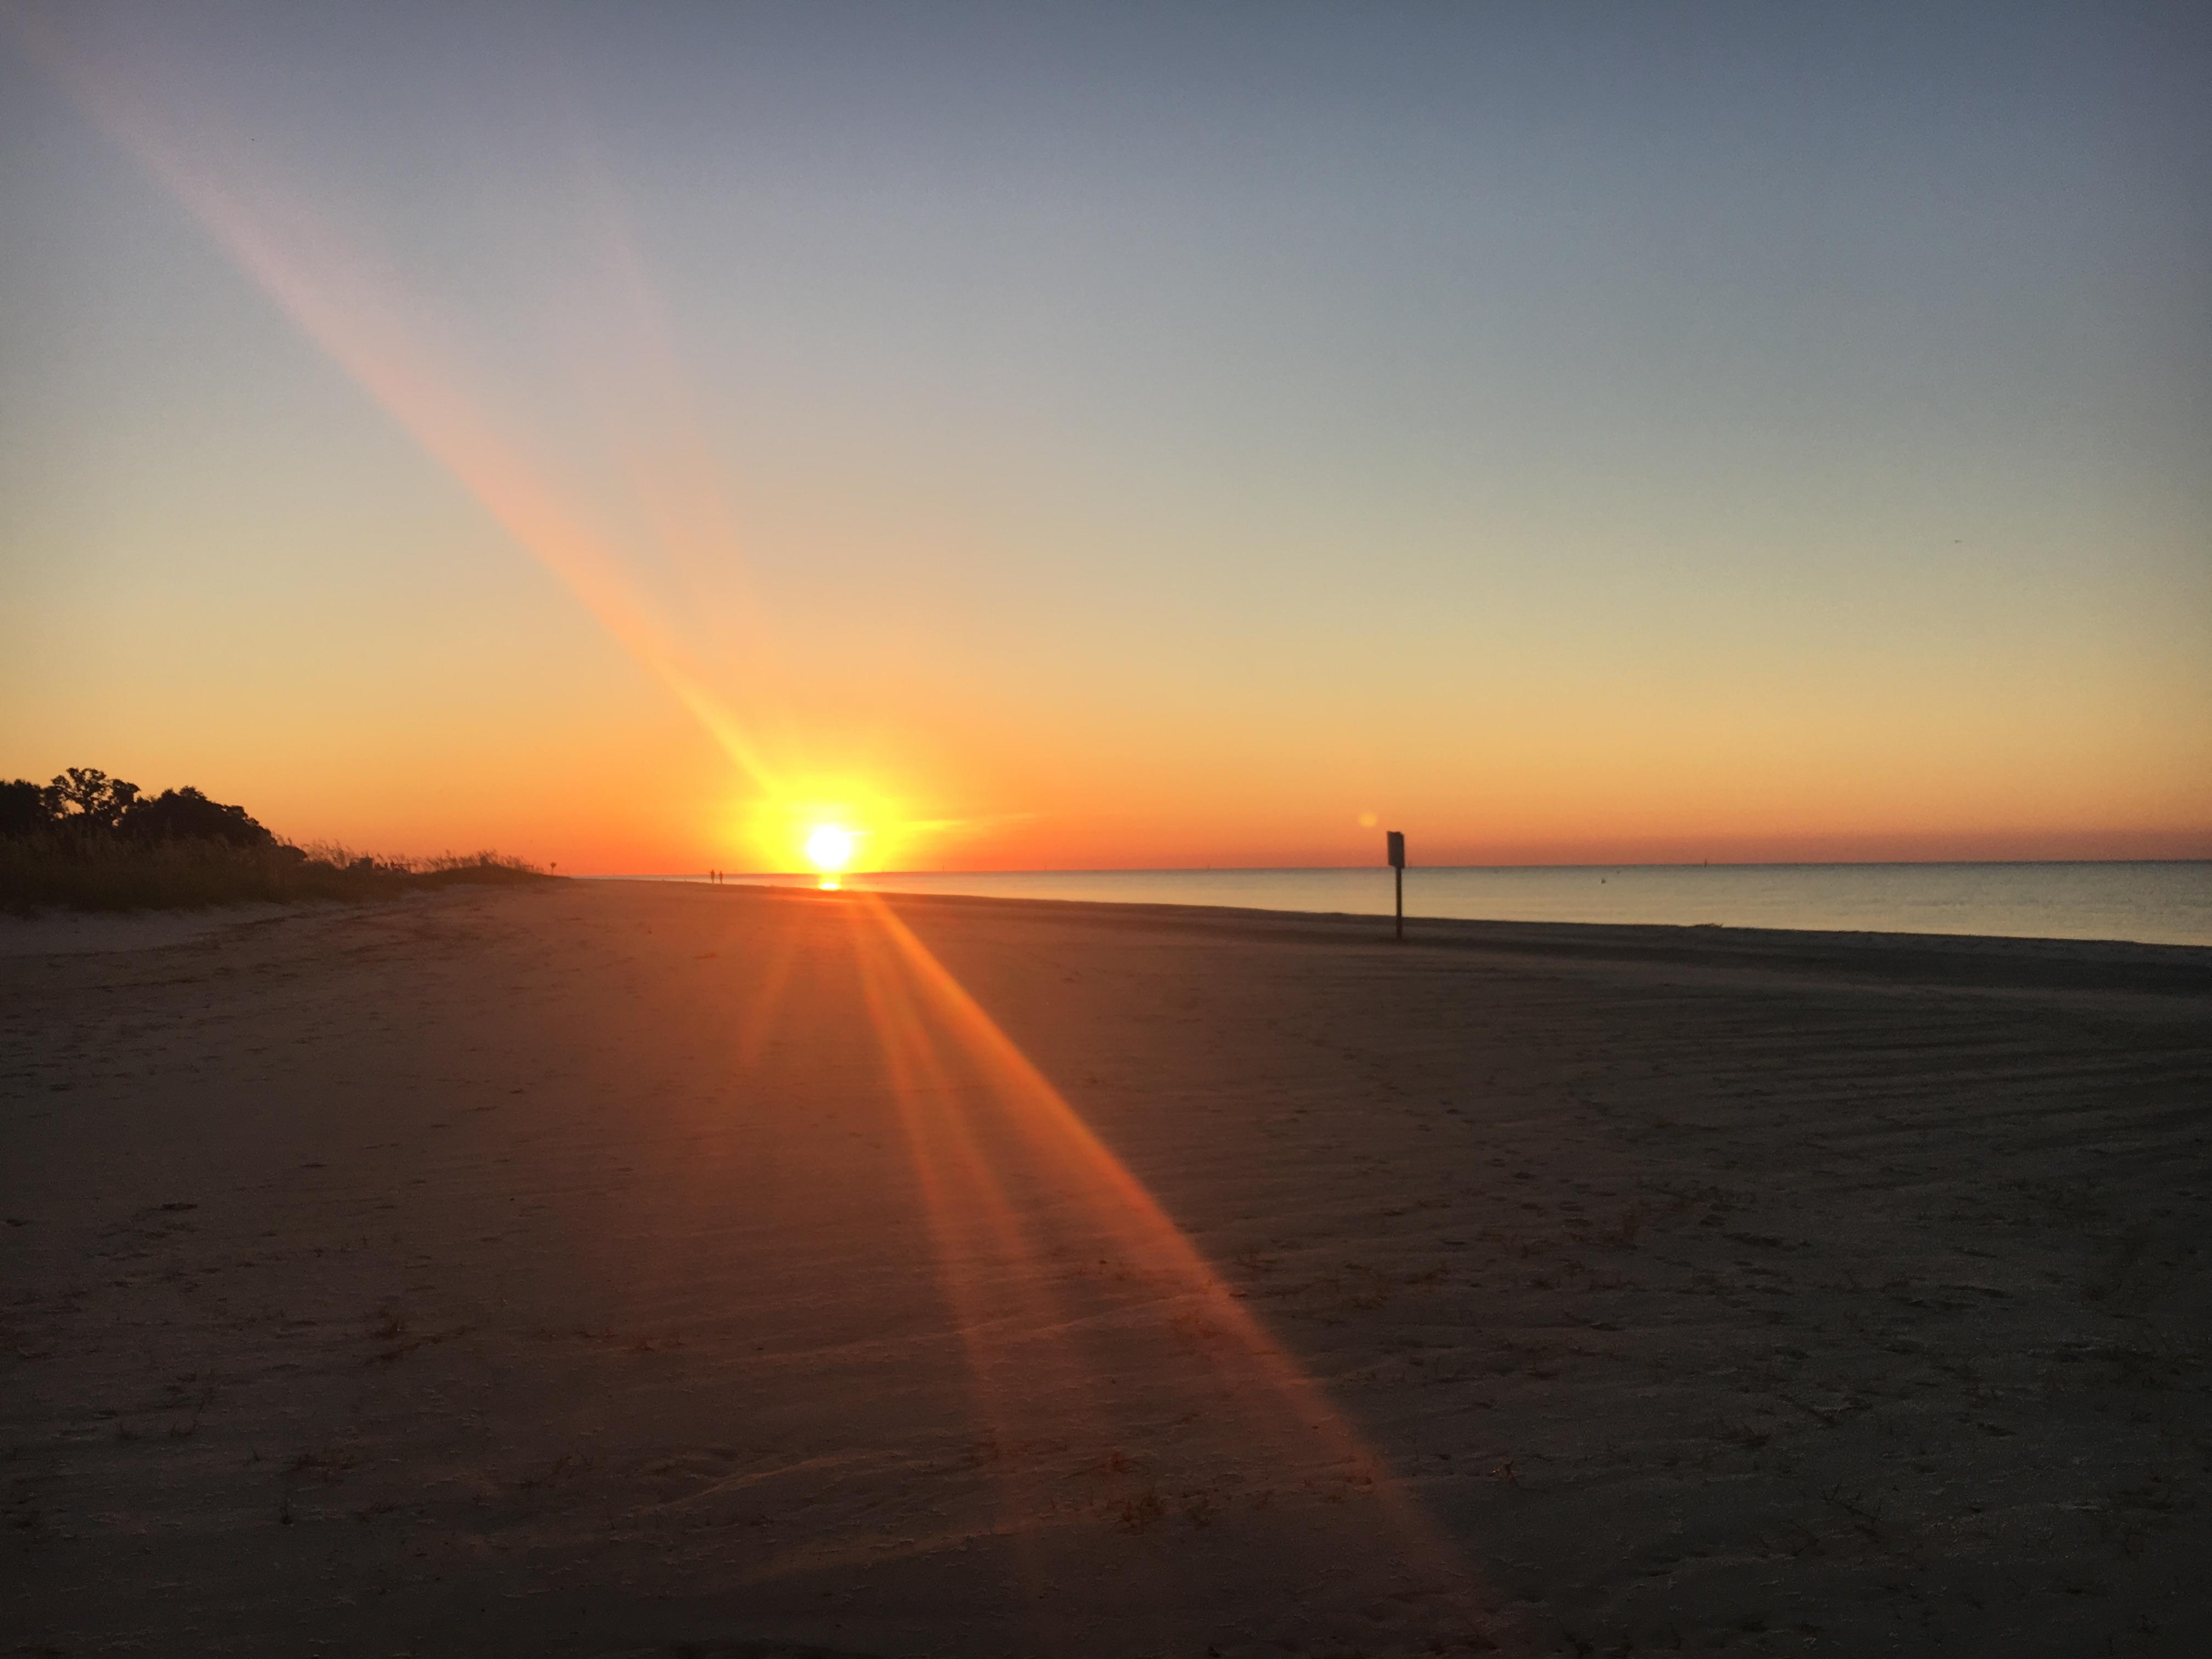 Sunrise on the Gulf Coast